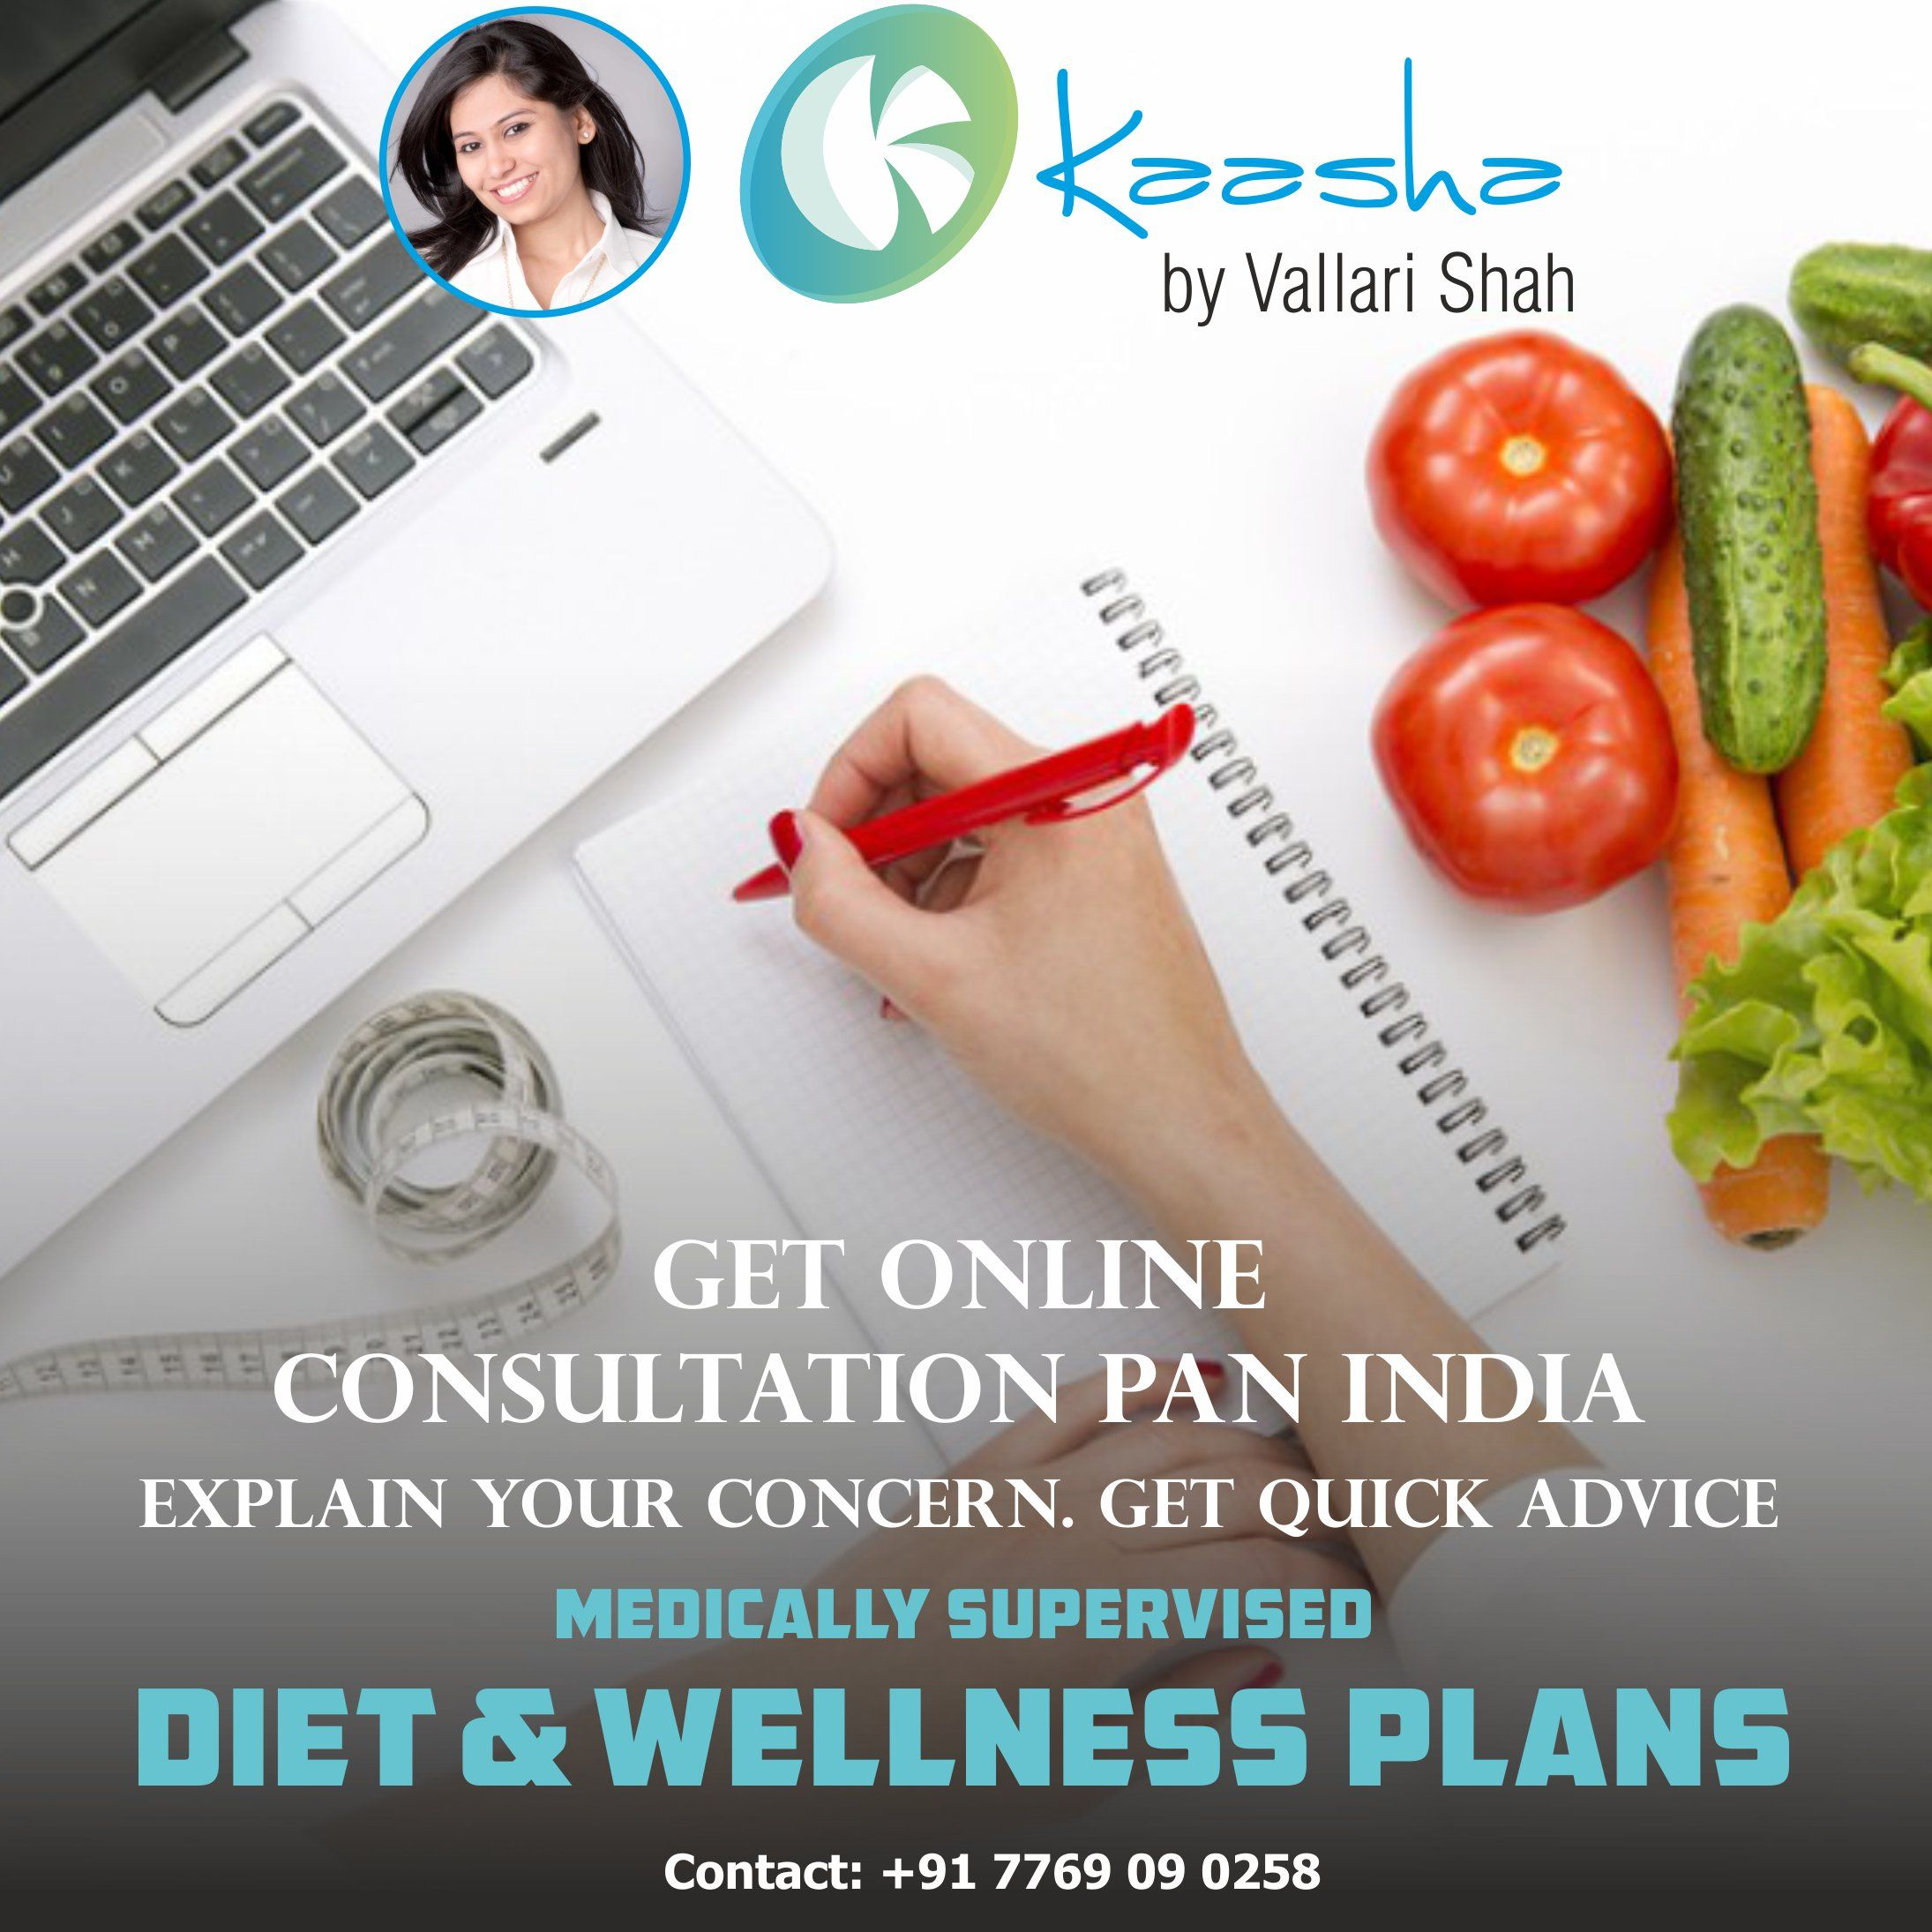 Got Questions Kaasha Now Providing Online Consultation Pan India Kaashabyvallarishah Healthbenefits Skindiet Healt Health Blogger Wellness Plan Skin Diet